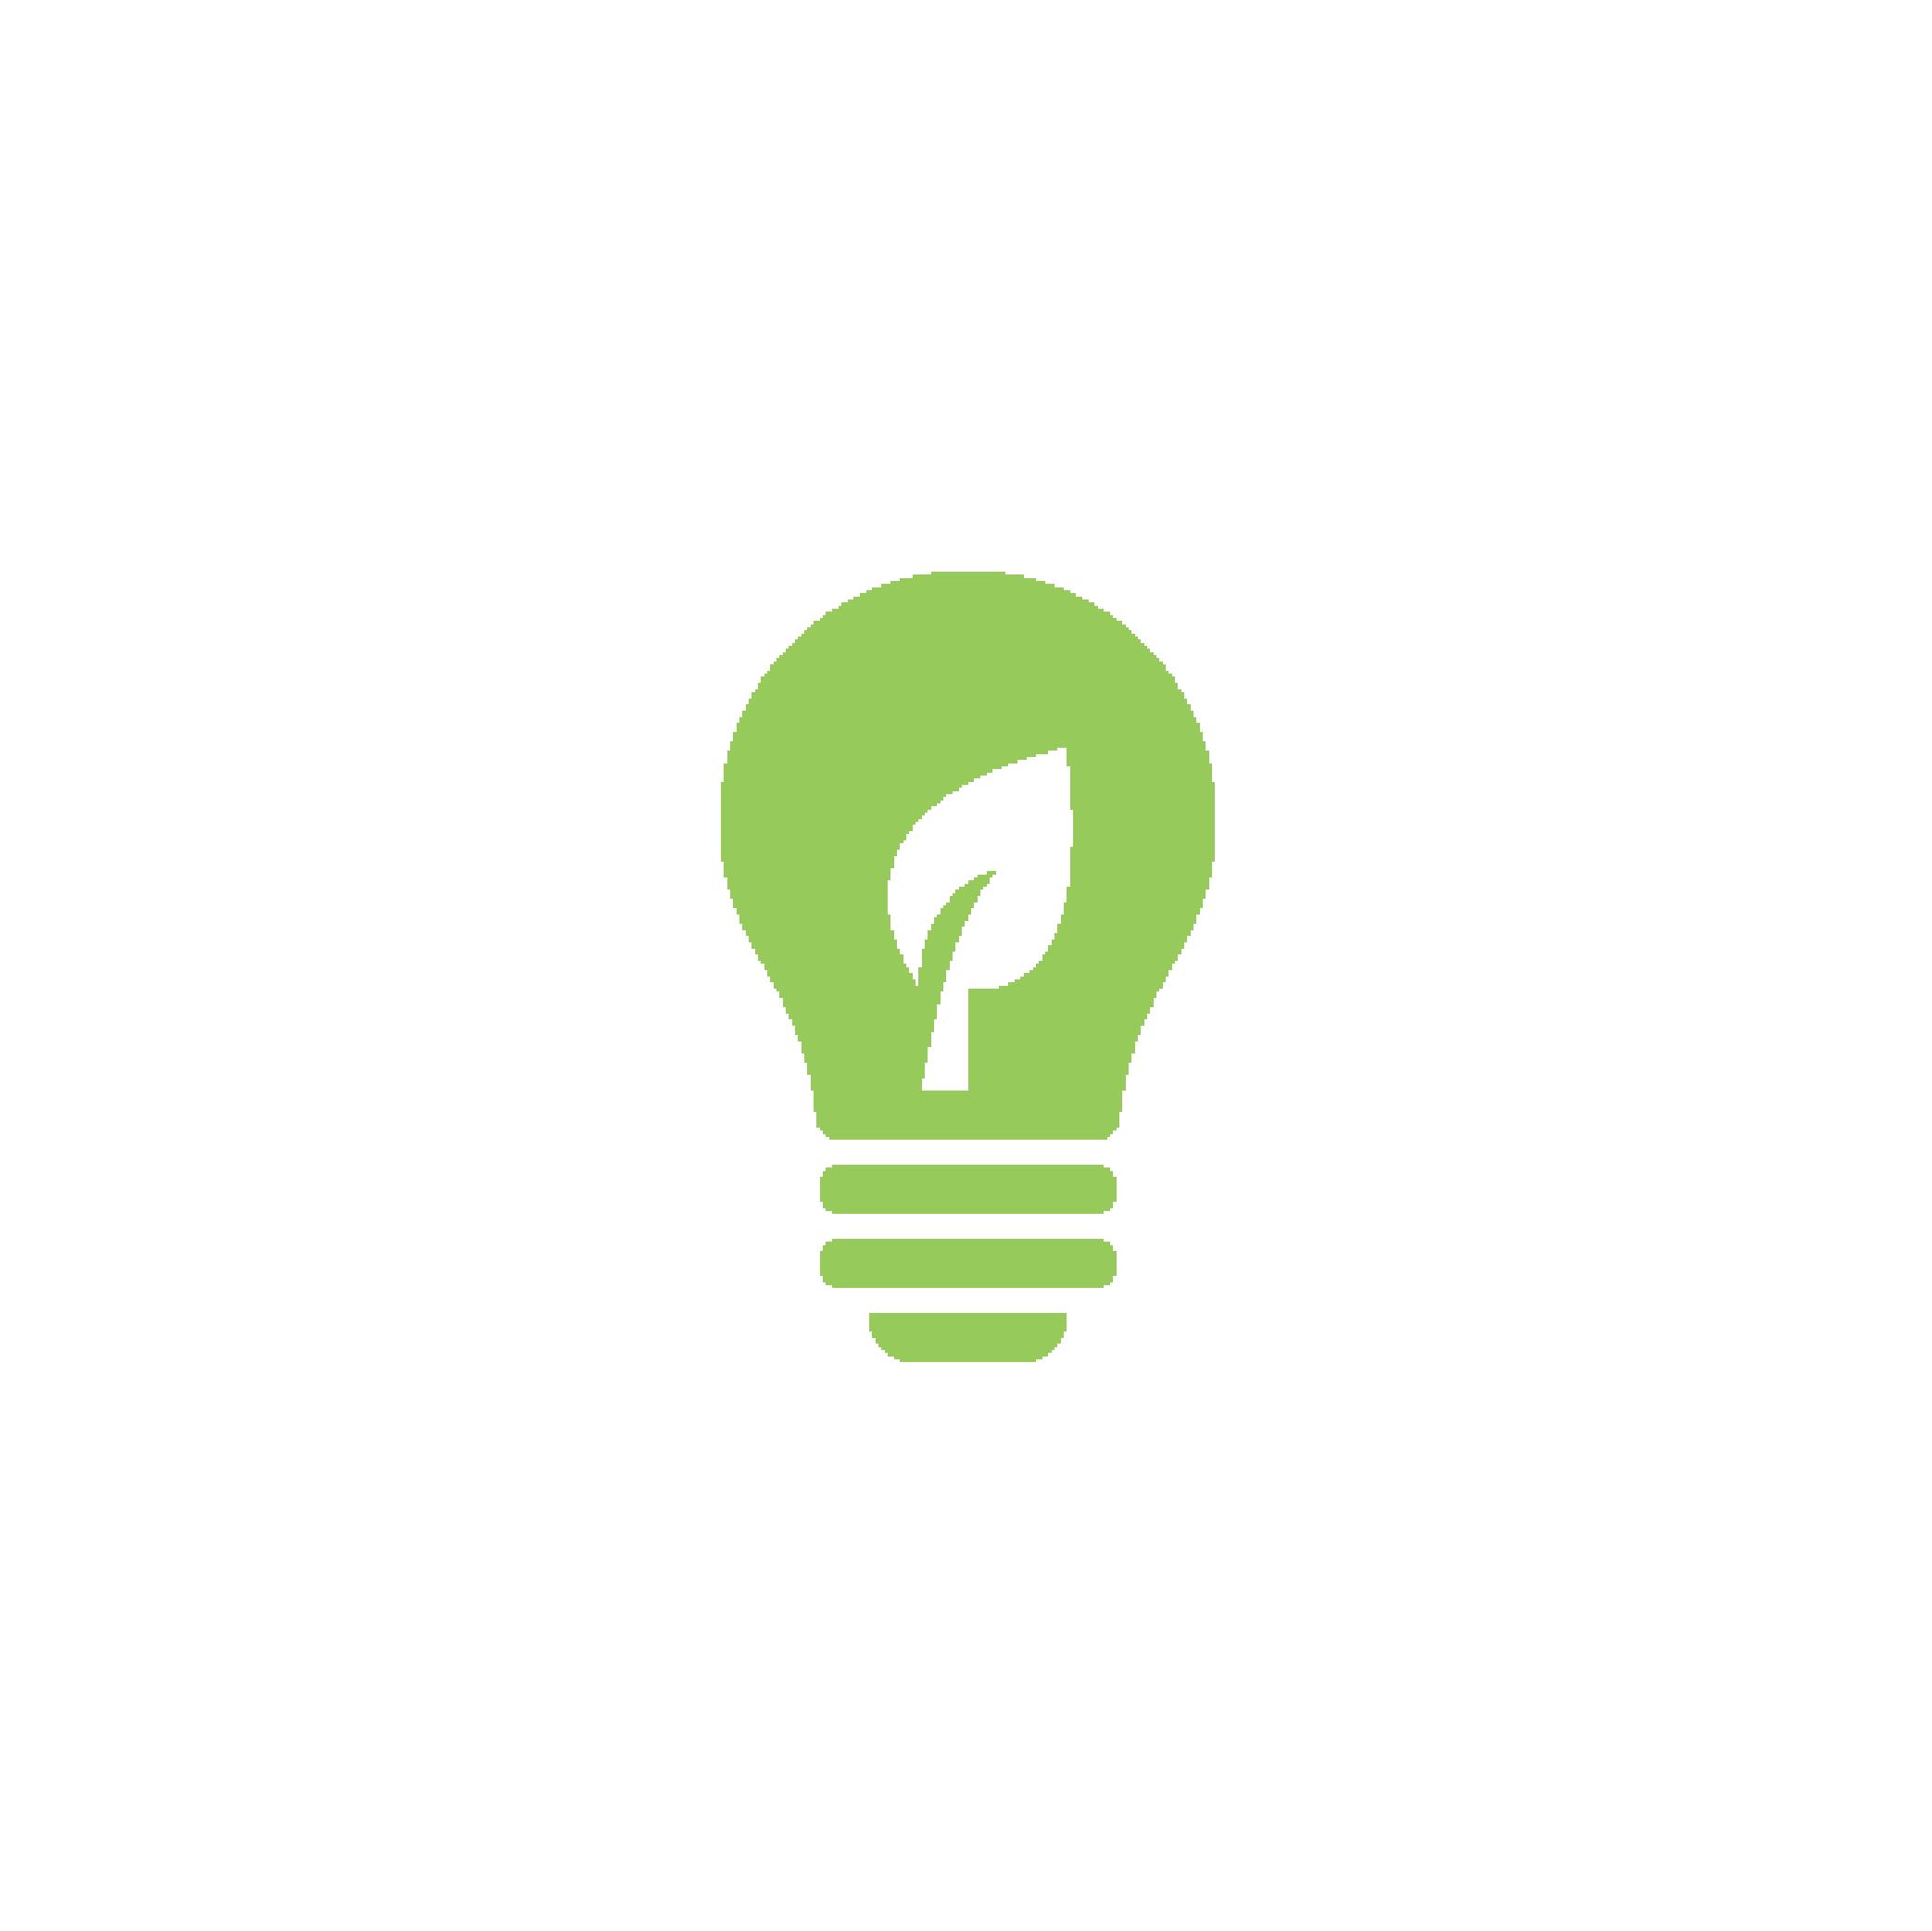 leaficon-01.png